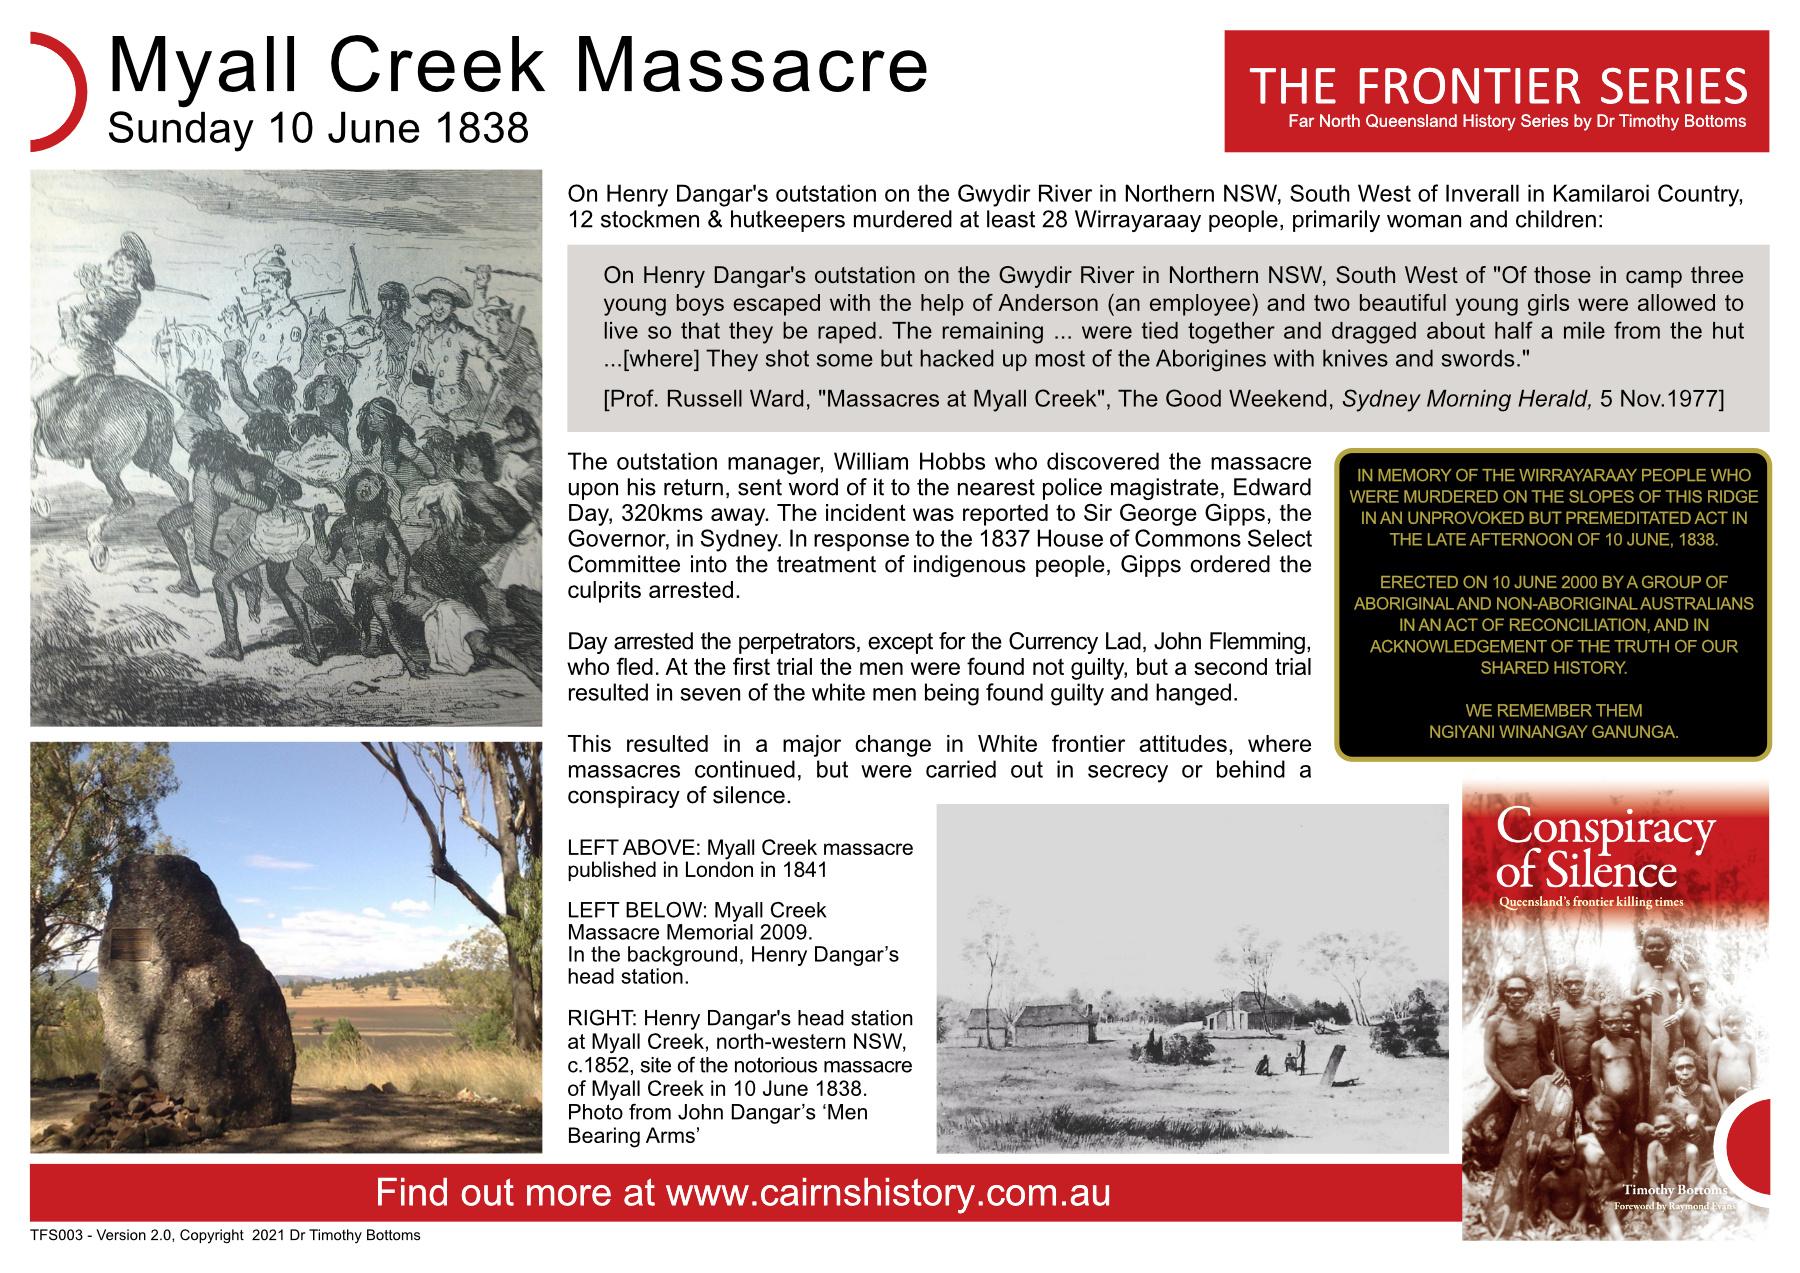 The Frontier Series Myall Creek Massacre